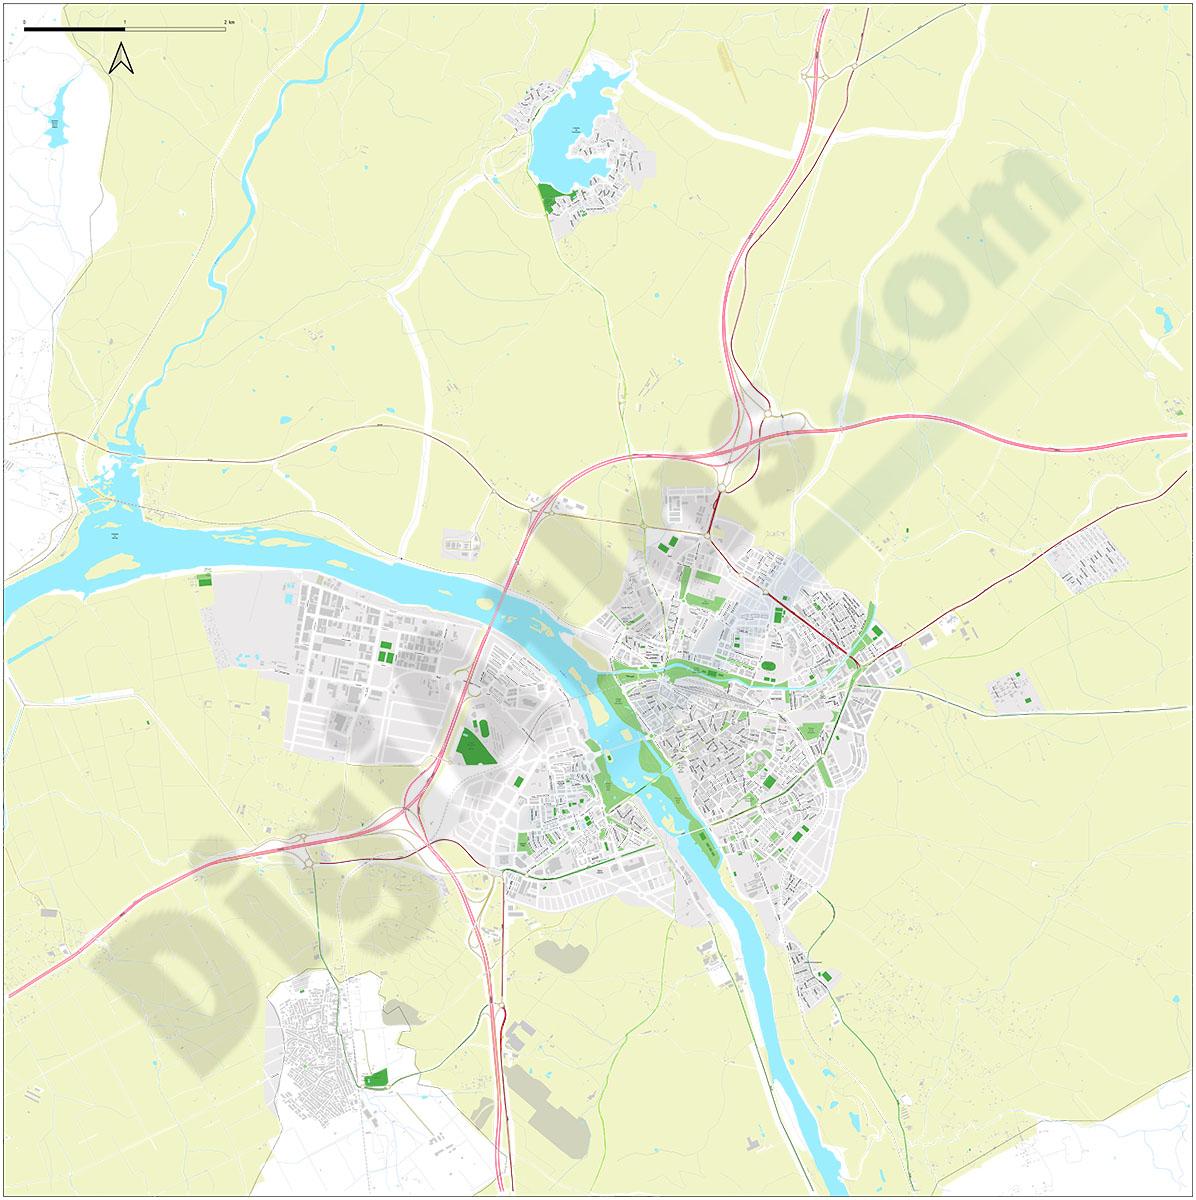 Merida - urban area map